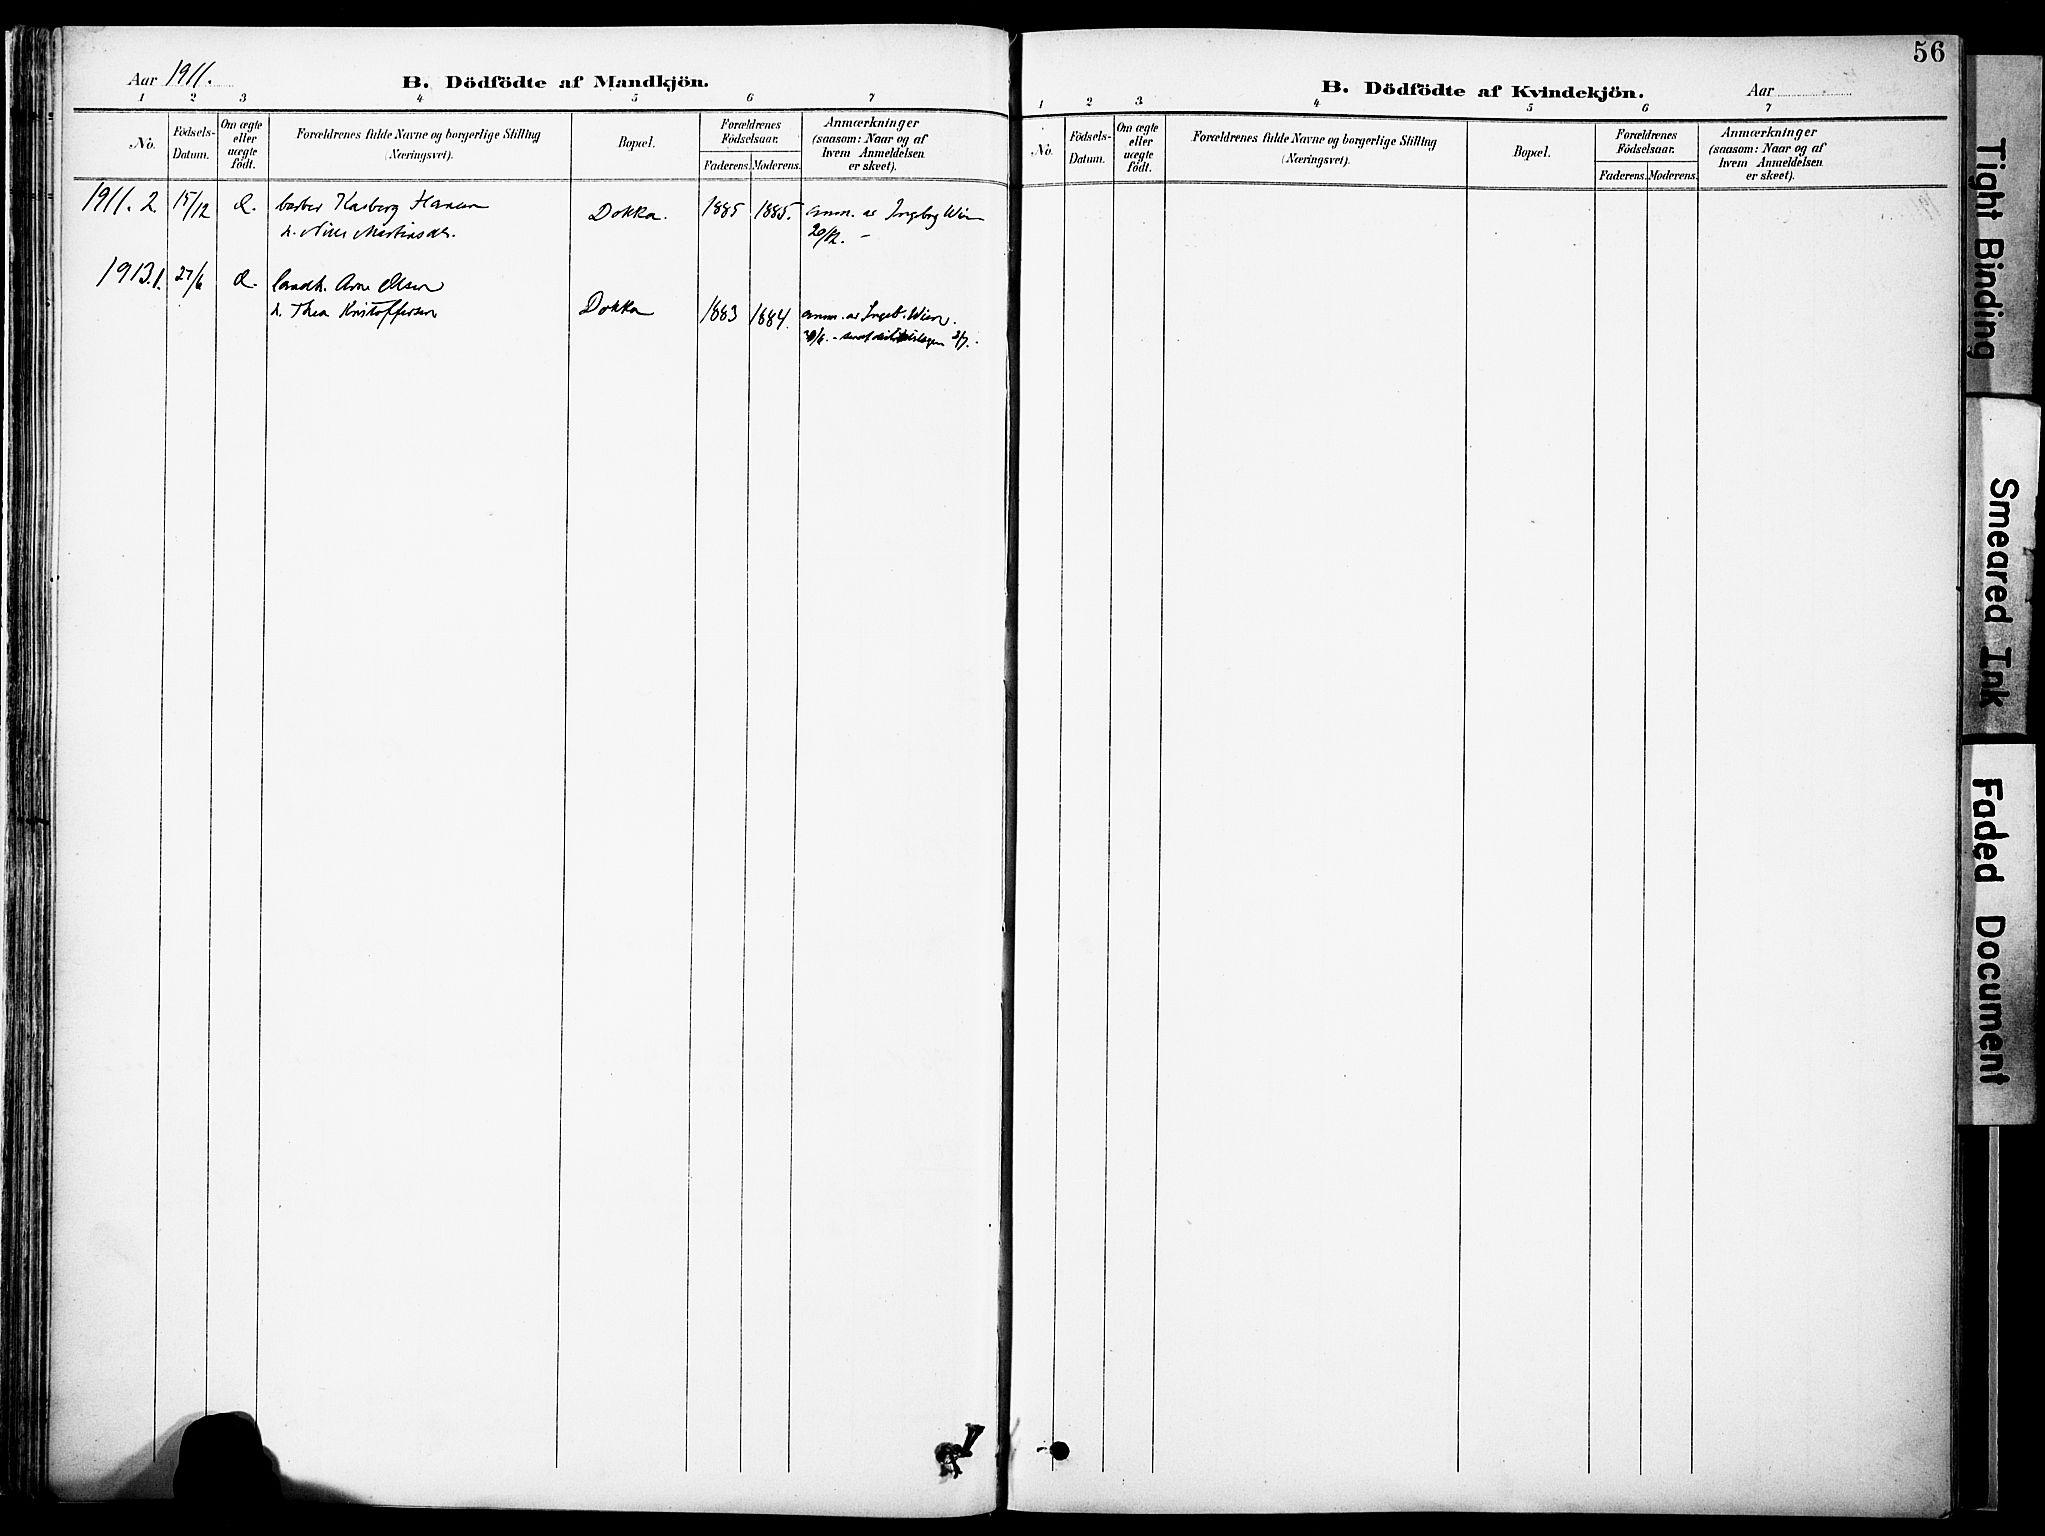 SAH, Nordre Land prestekontor, Ministerialbok nr. 6, 1897-1914, s. 56